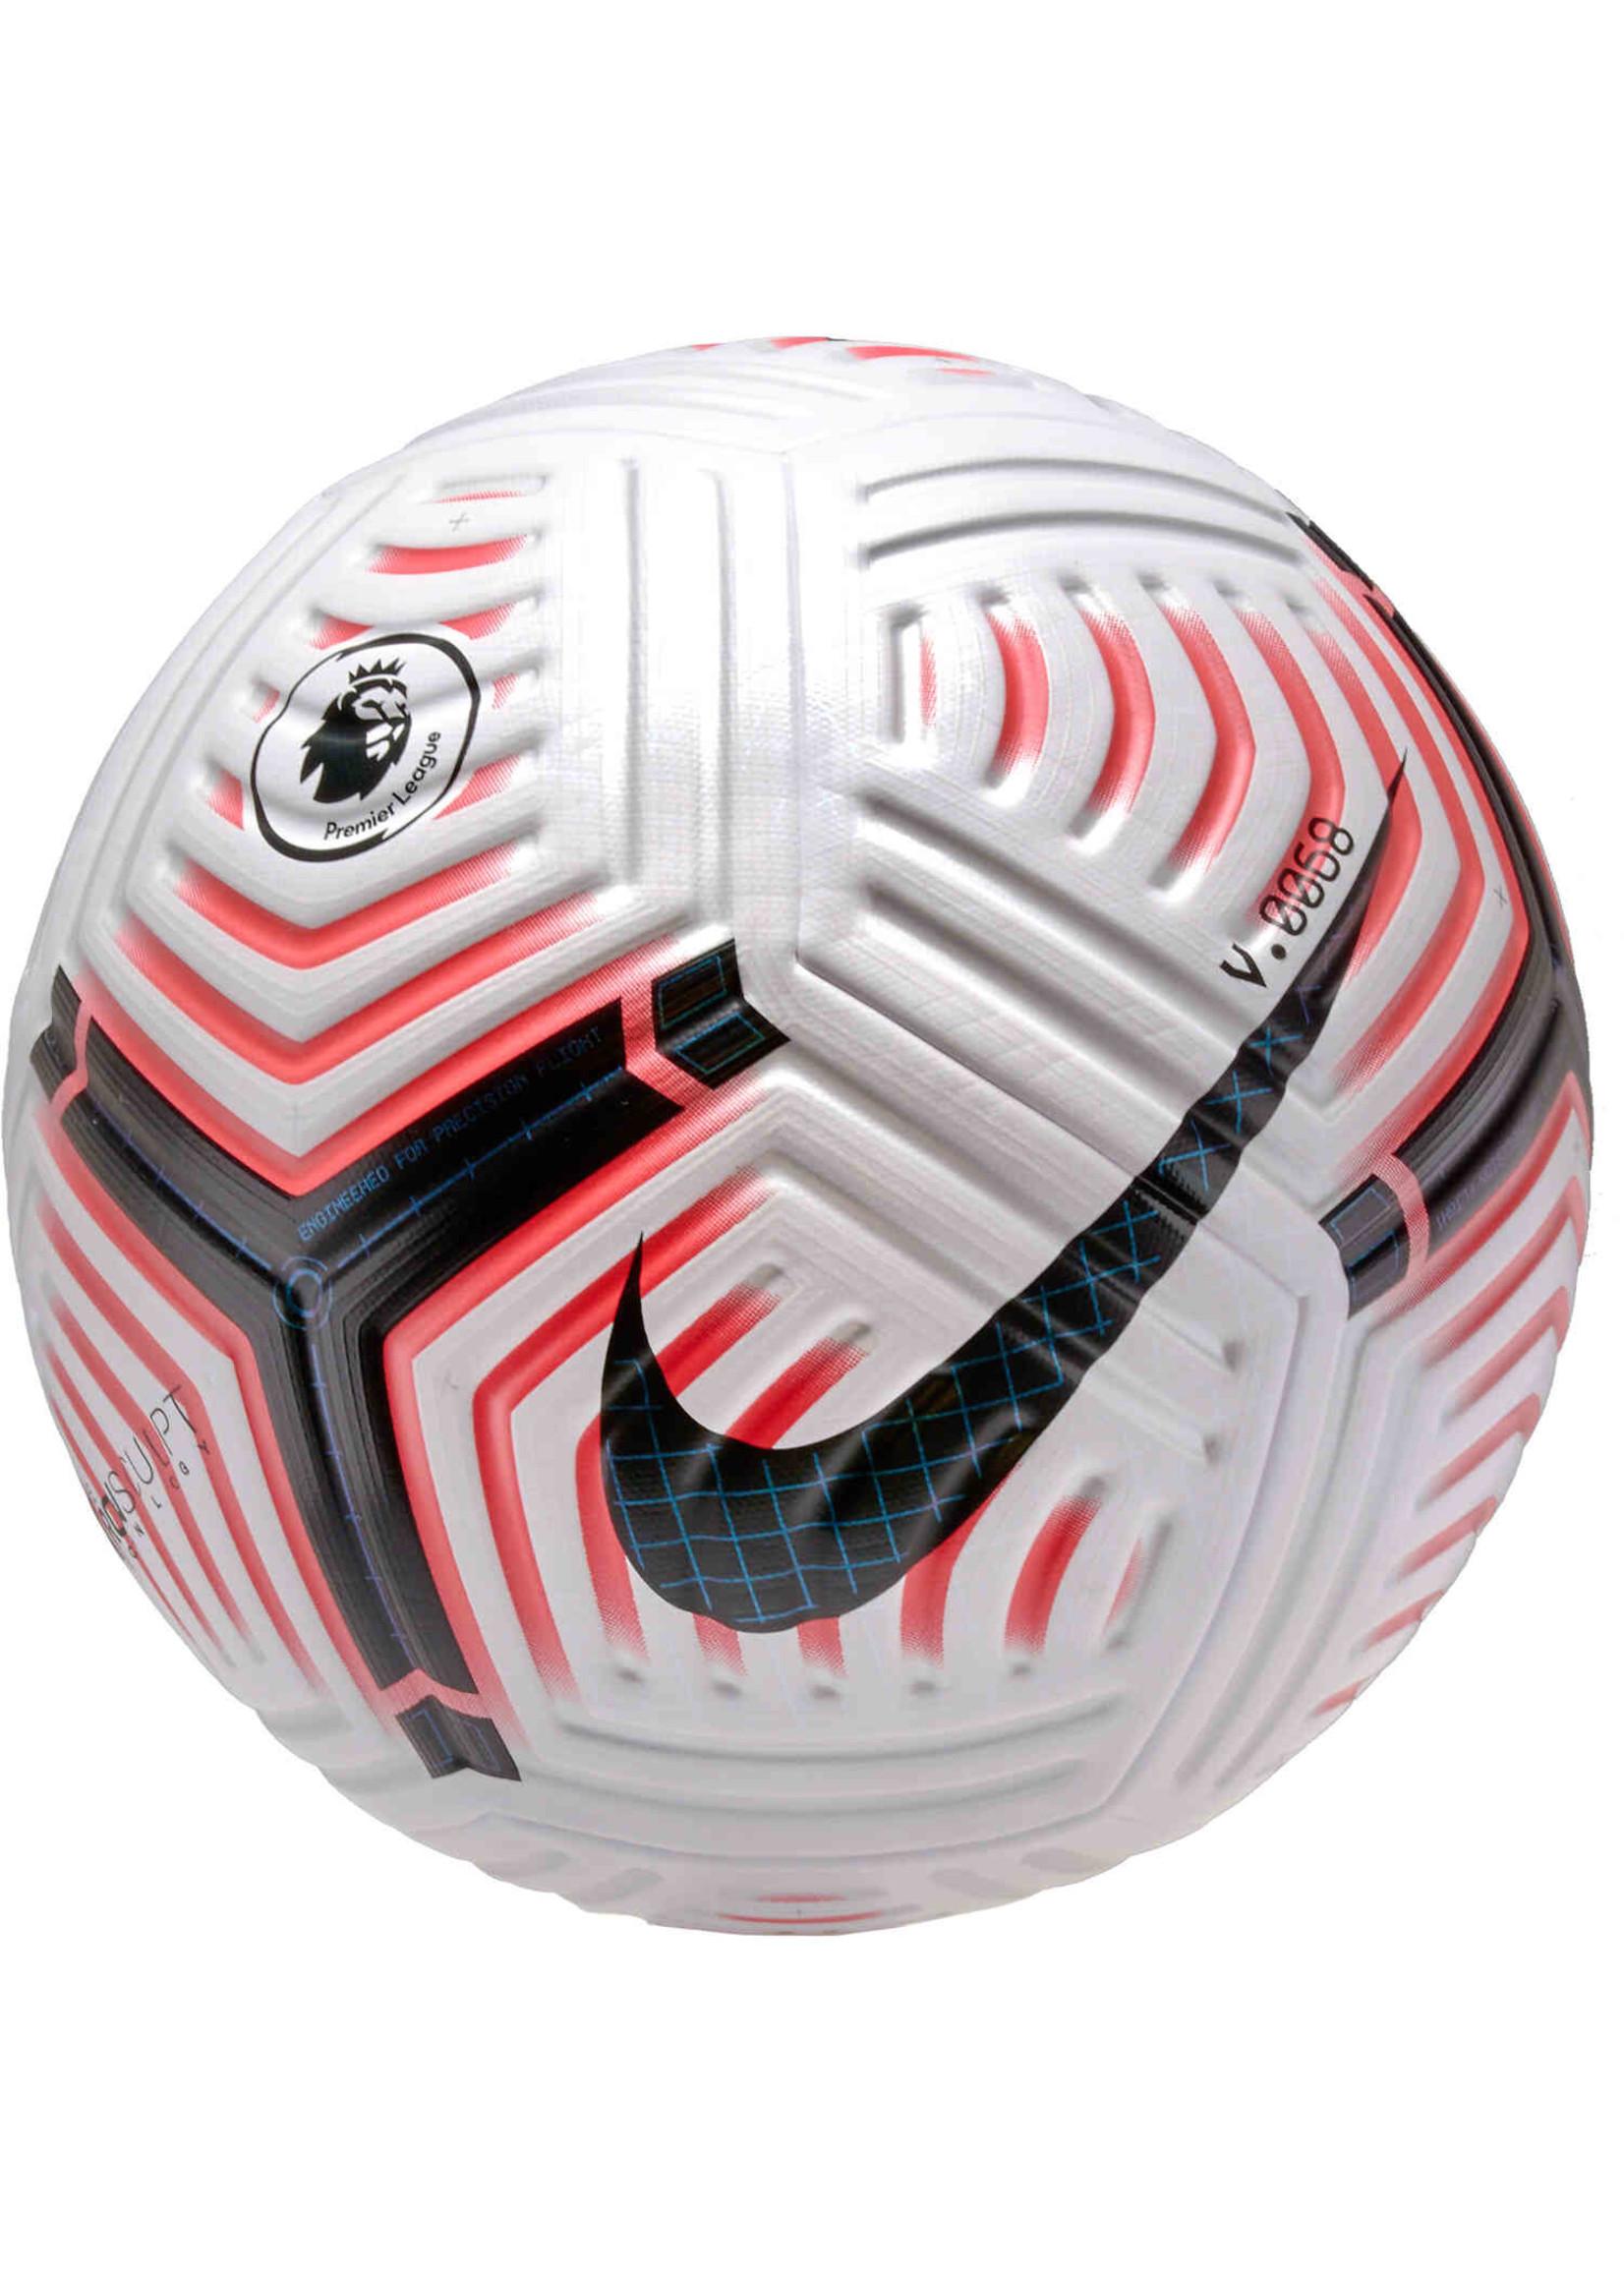 Nike PREMIER LEAGUE FLIGHT BALL